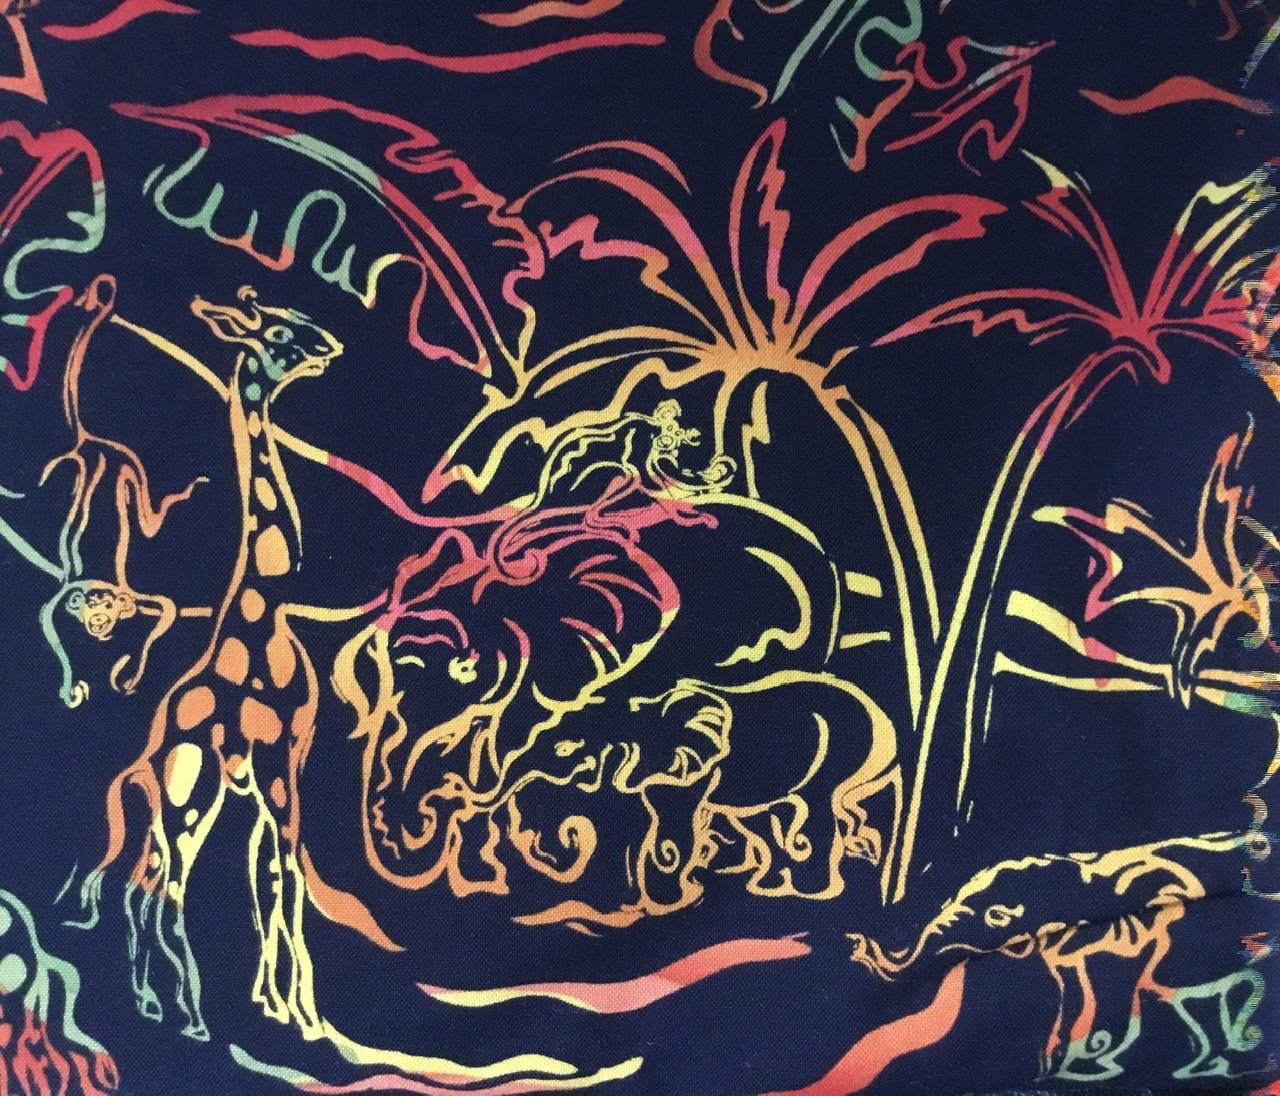 Jungle animals on black